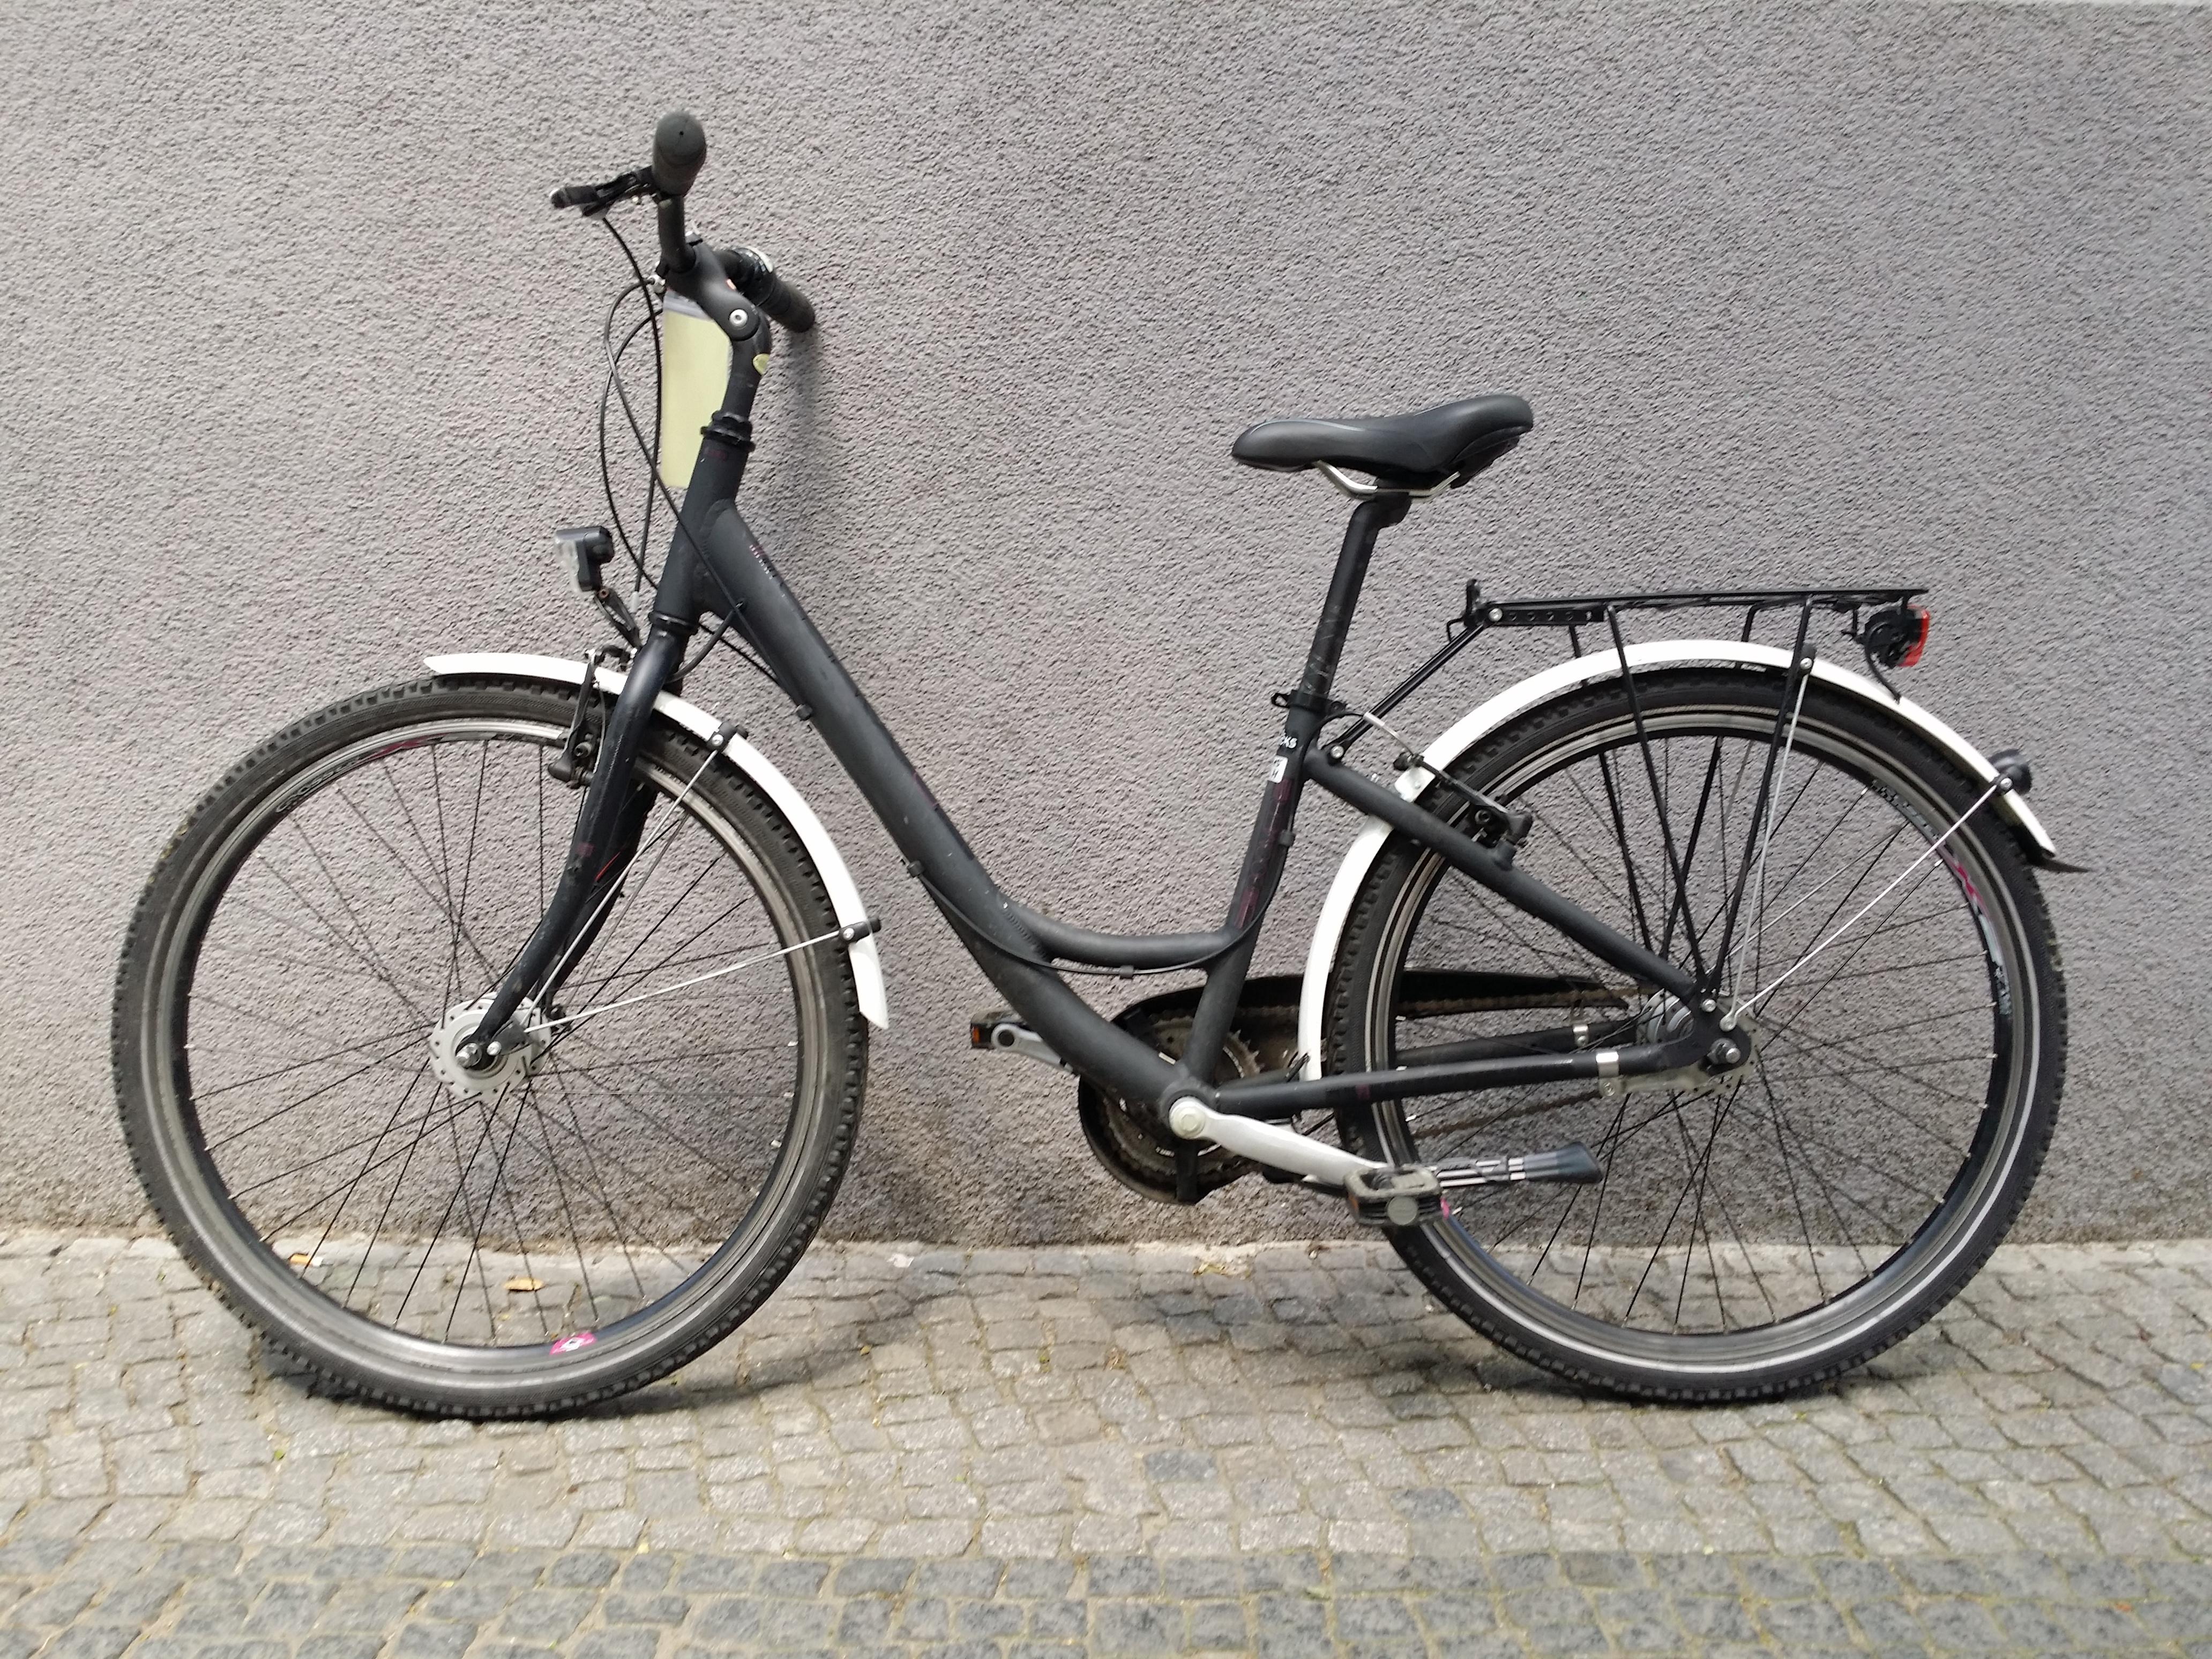 gebrauchtes 26' Damenrad